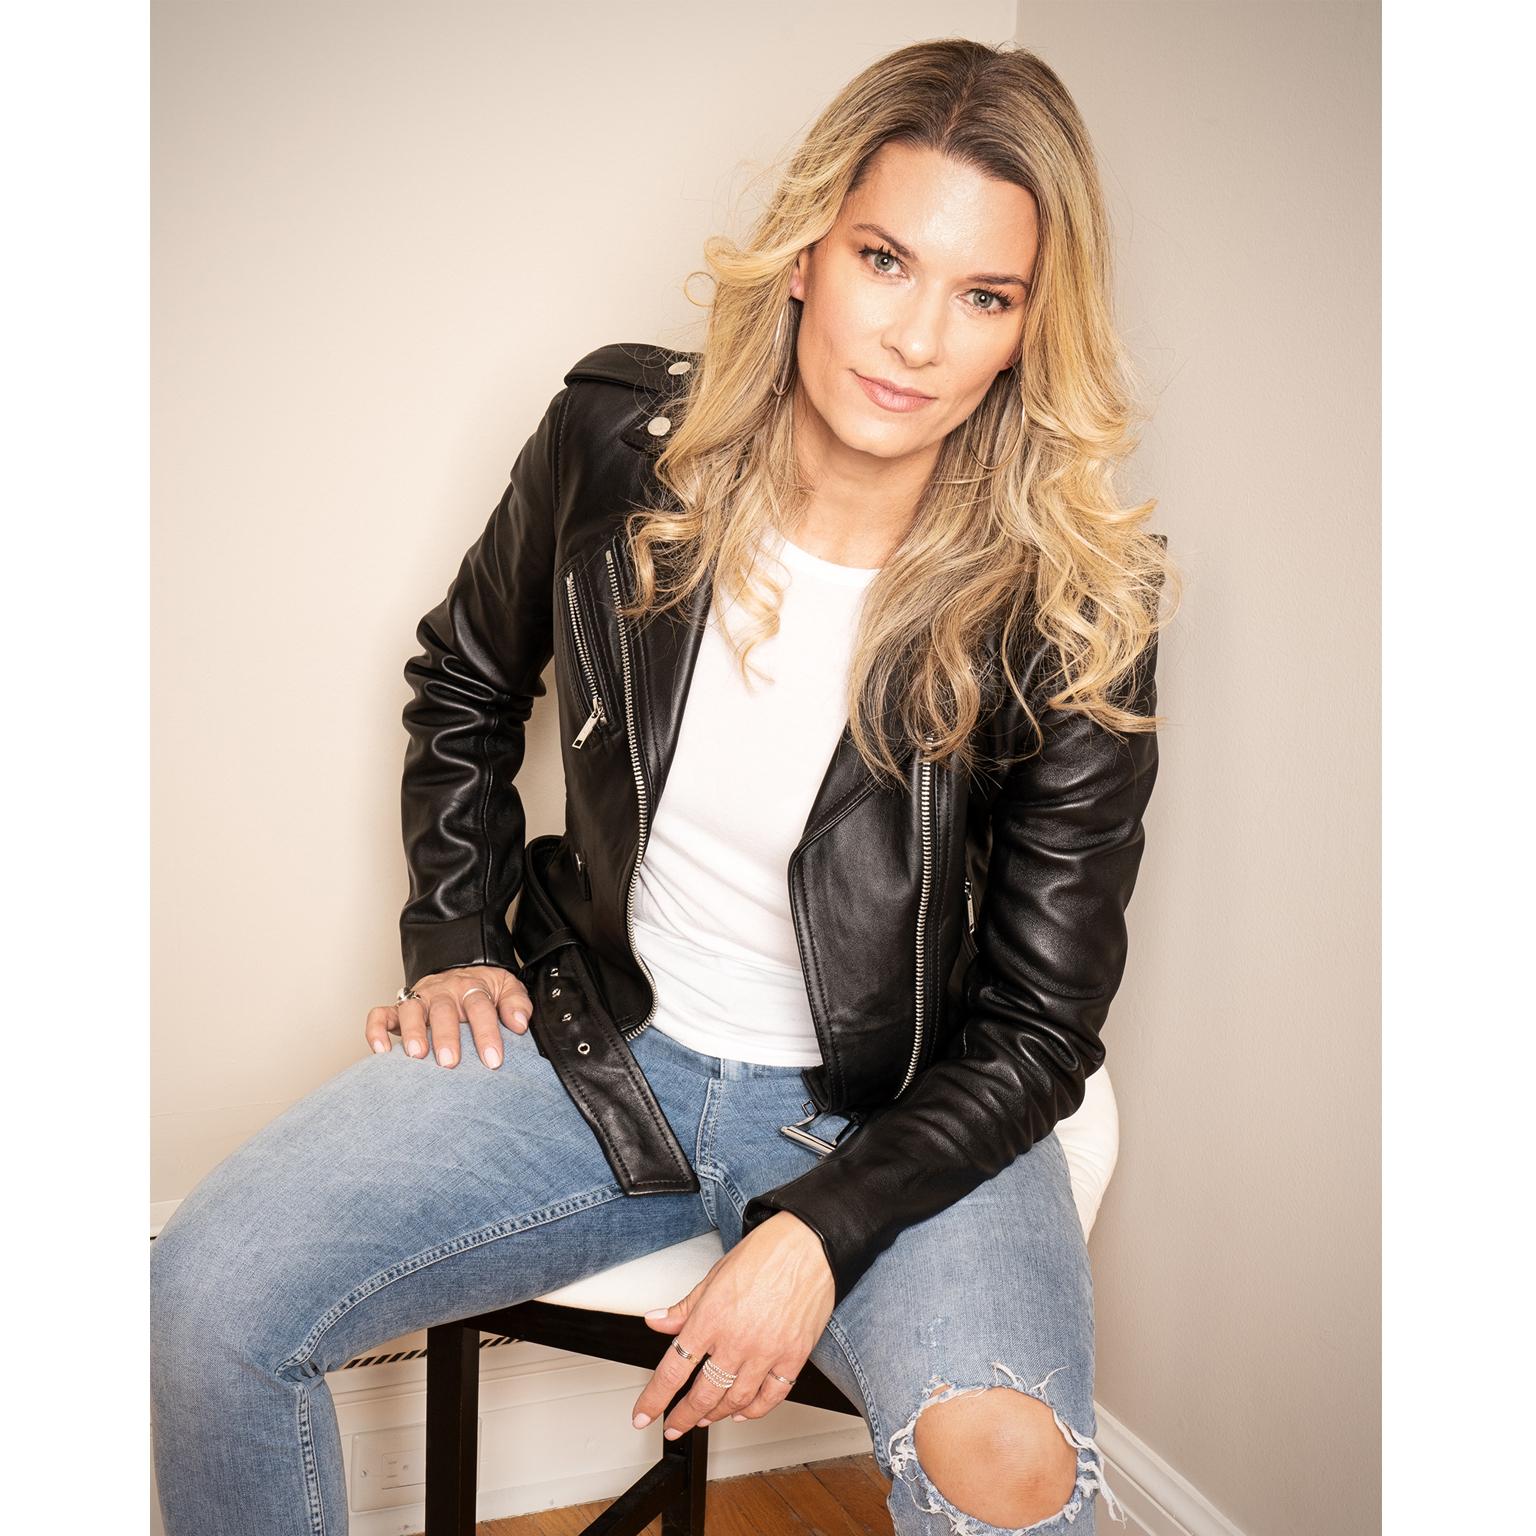 Toronto-Fitness-Model-Agency-Lifestyle-Fashion-Model-Adrienne-Davis